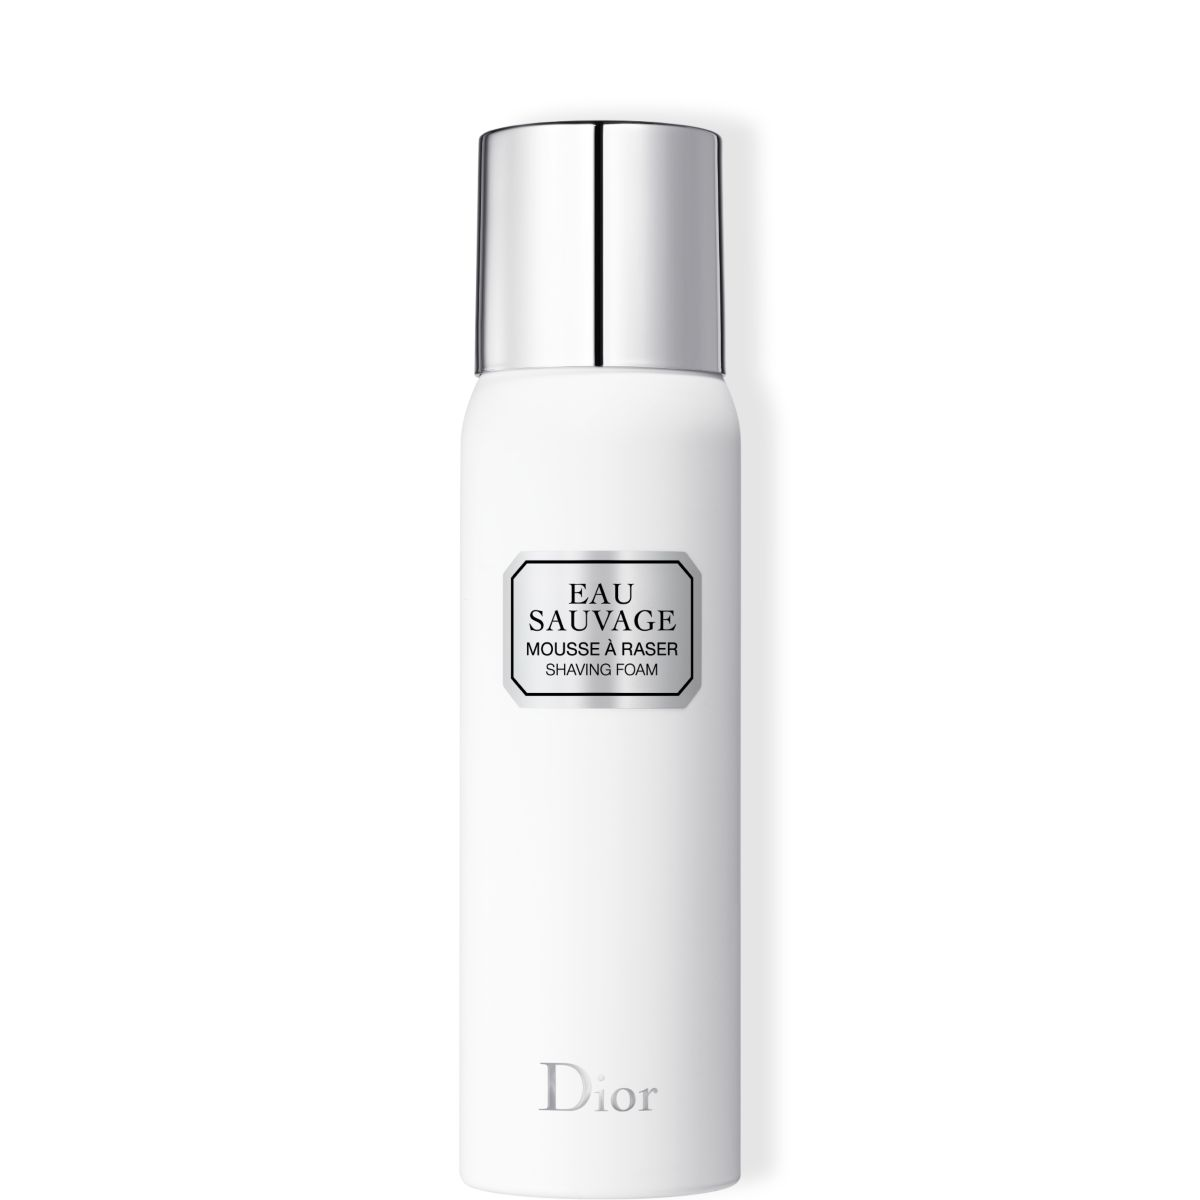 Dior - Eau Sauvage - Mousse à raser 200 ml